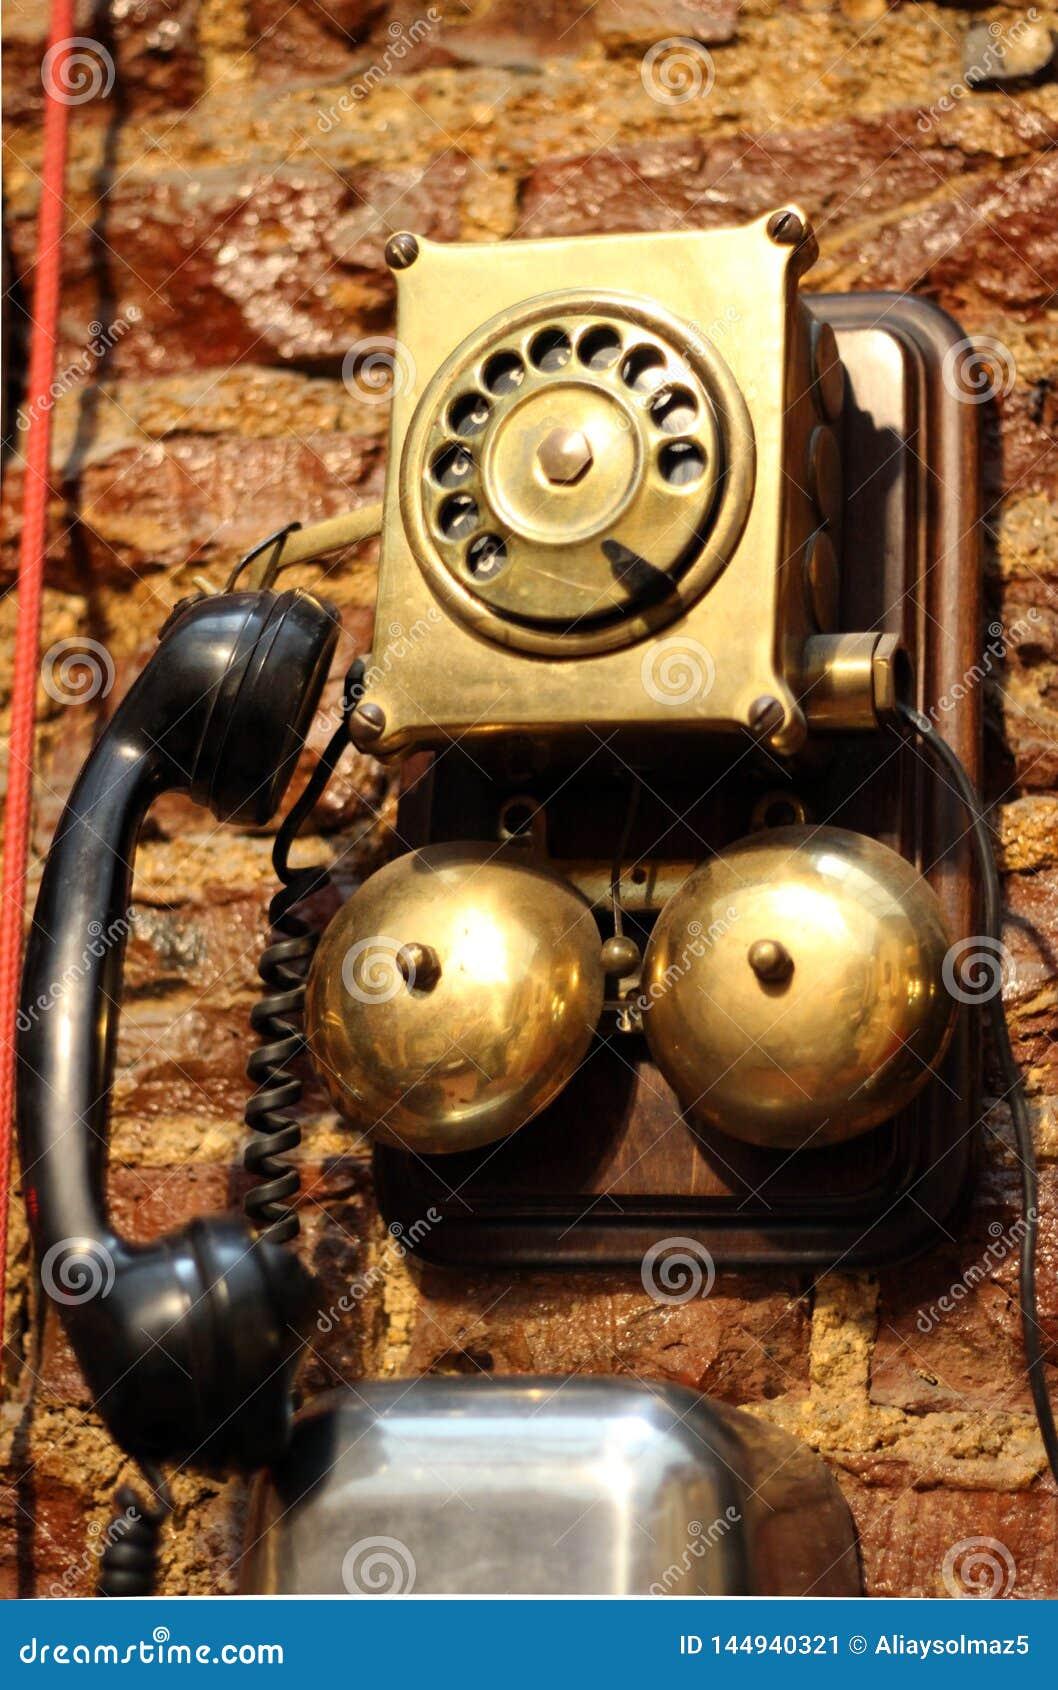 Antikes Telefon, sehr altes benutztes Weinlese-Telefon ab 1950 s